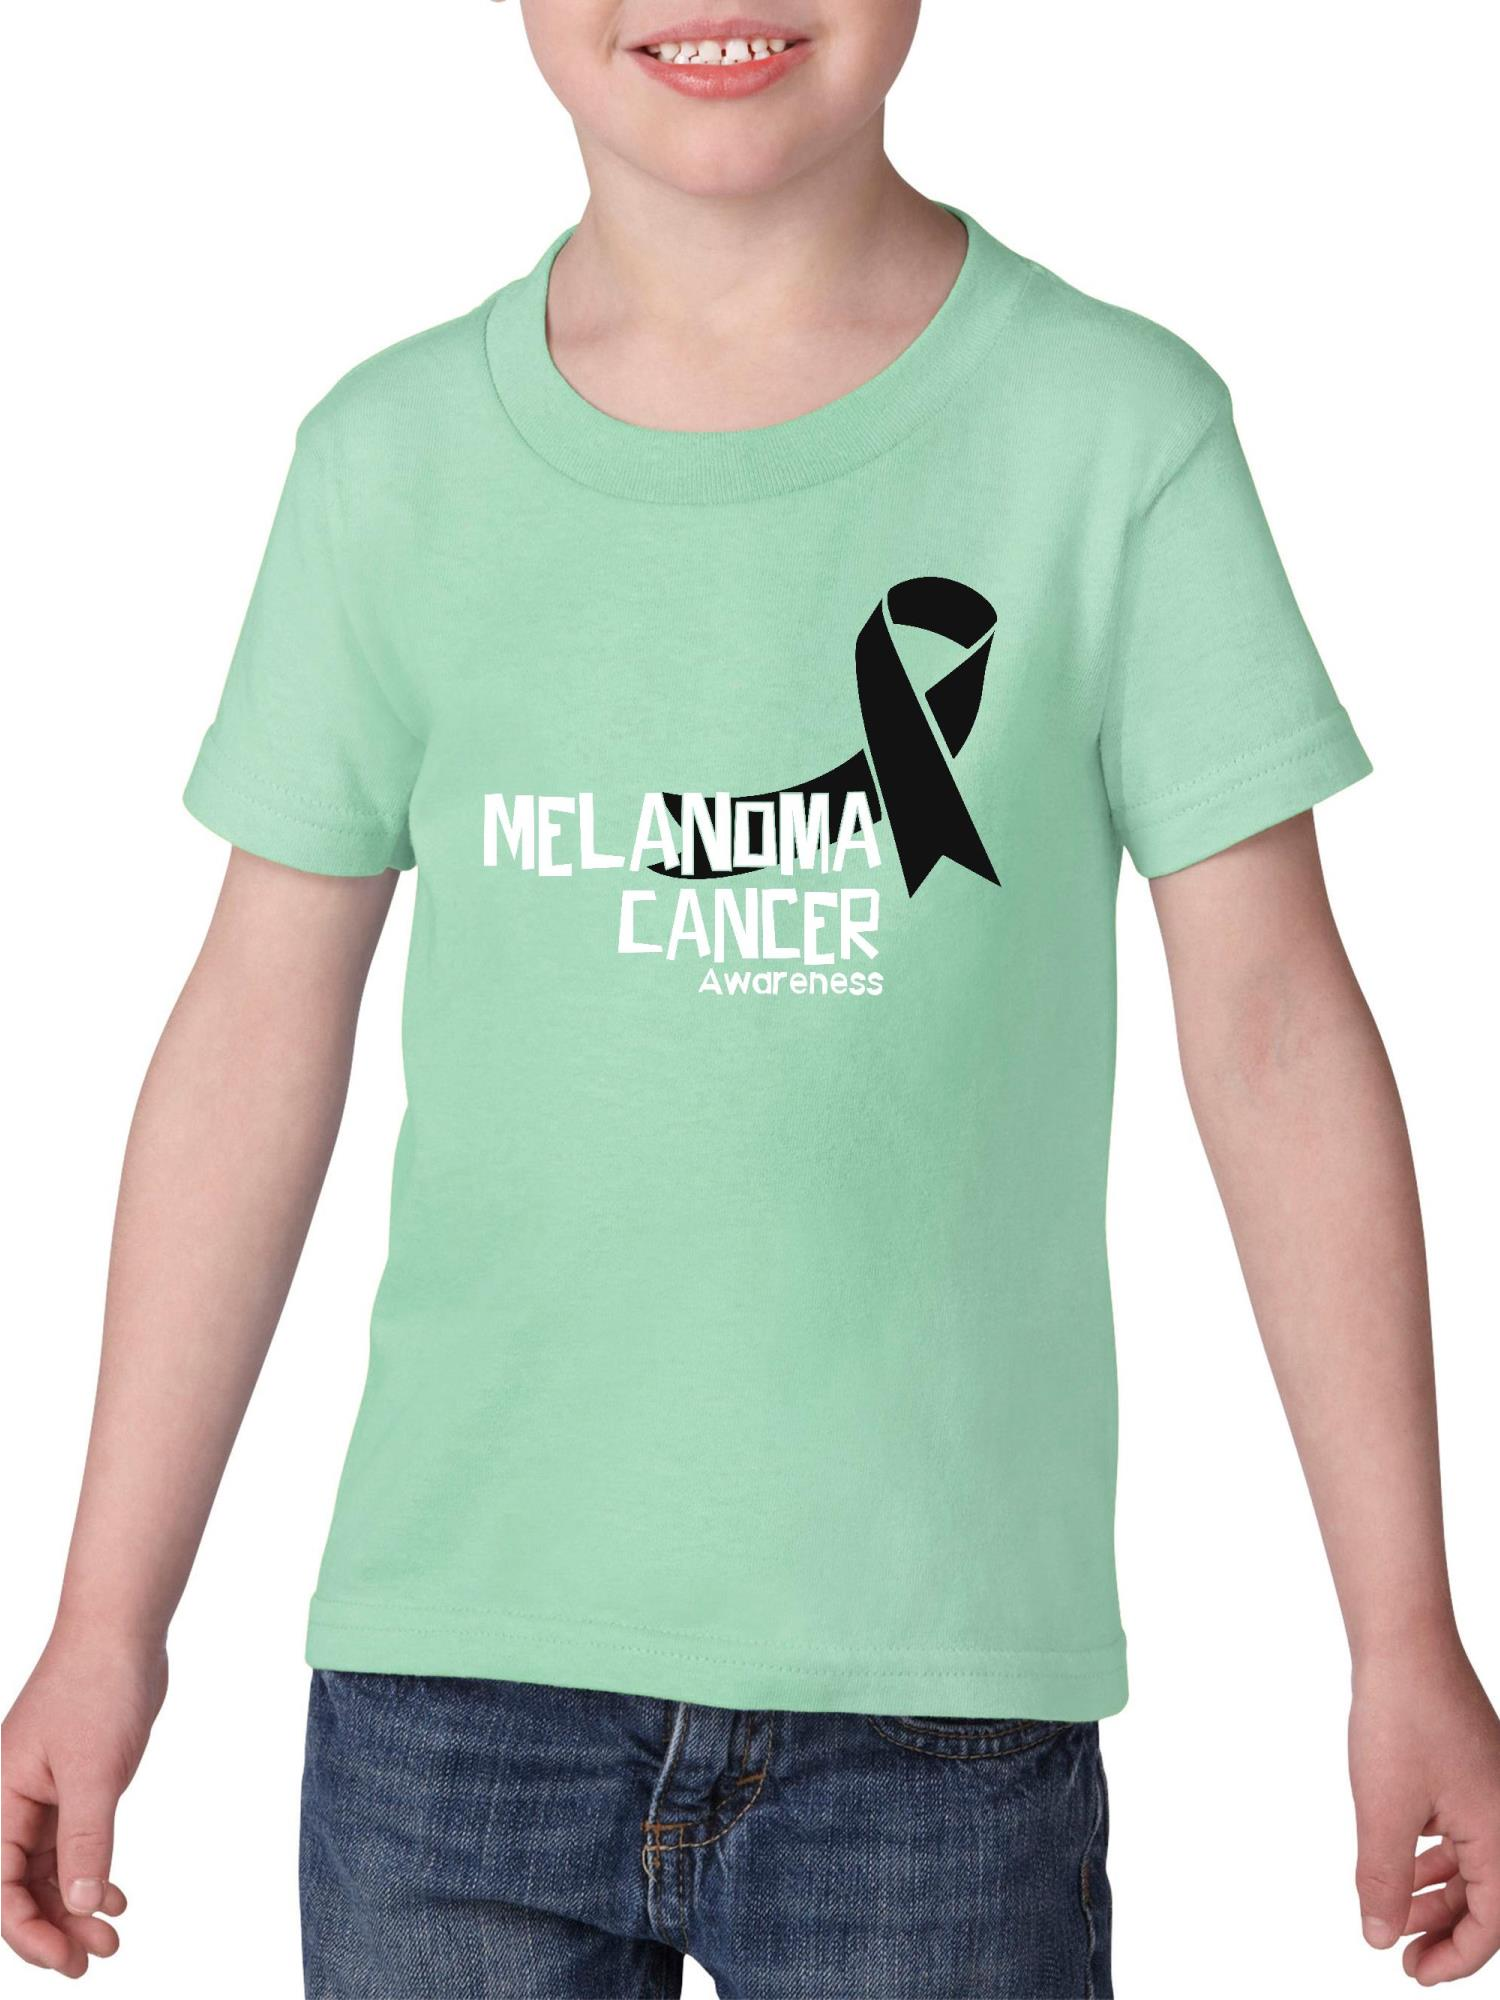 Melanoma Skin Cancer Awareness Heavy Cotton Toddler Kids T-Shirt Tee Clothing